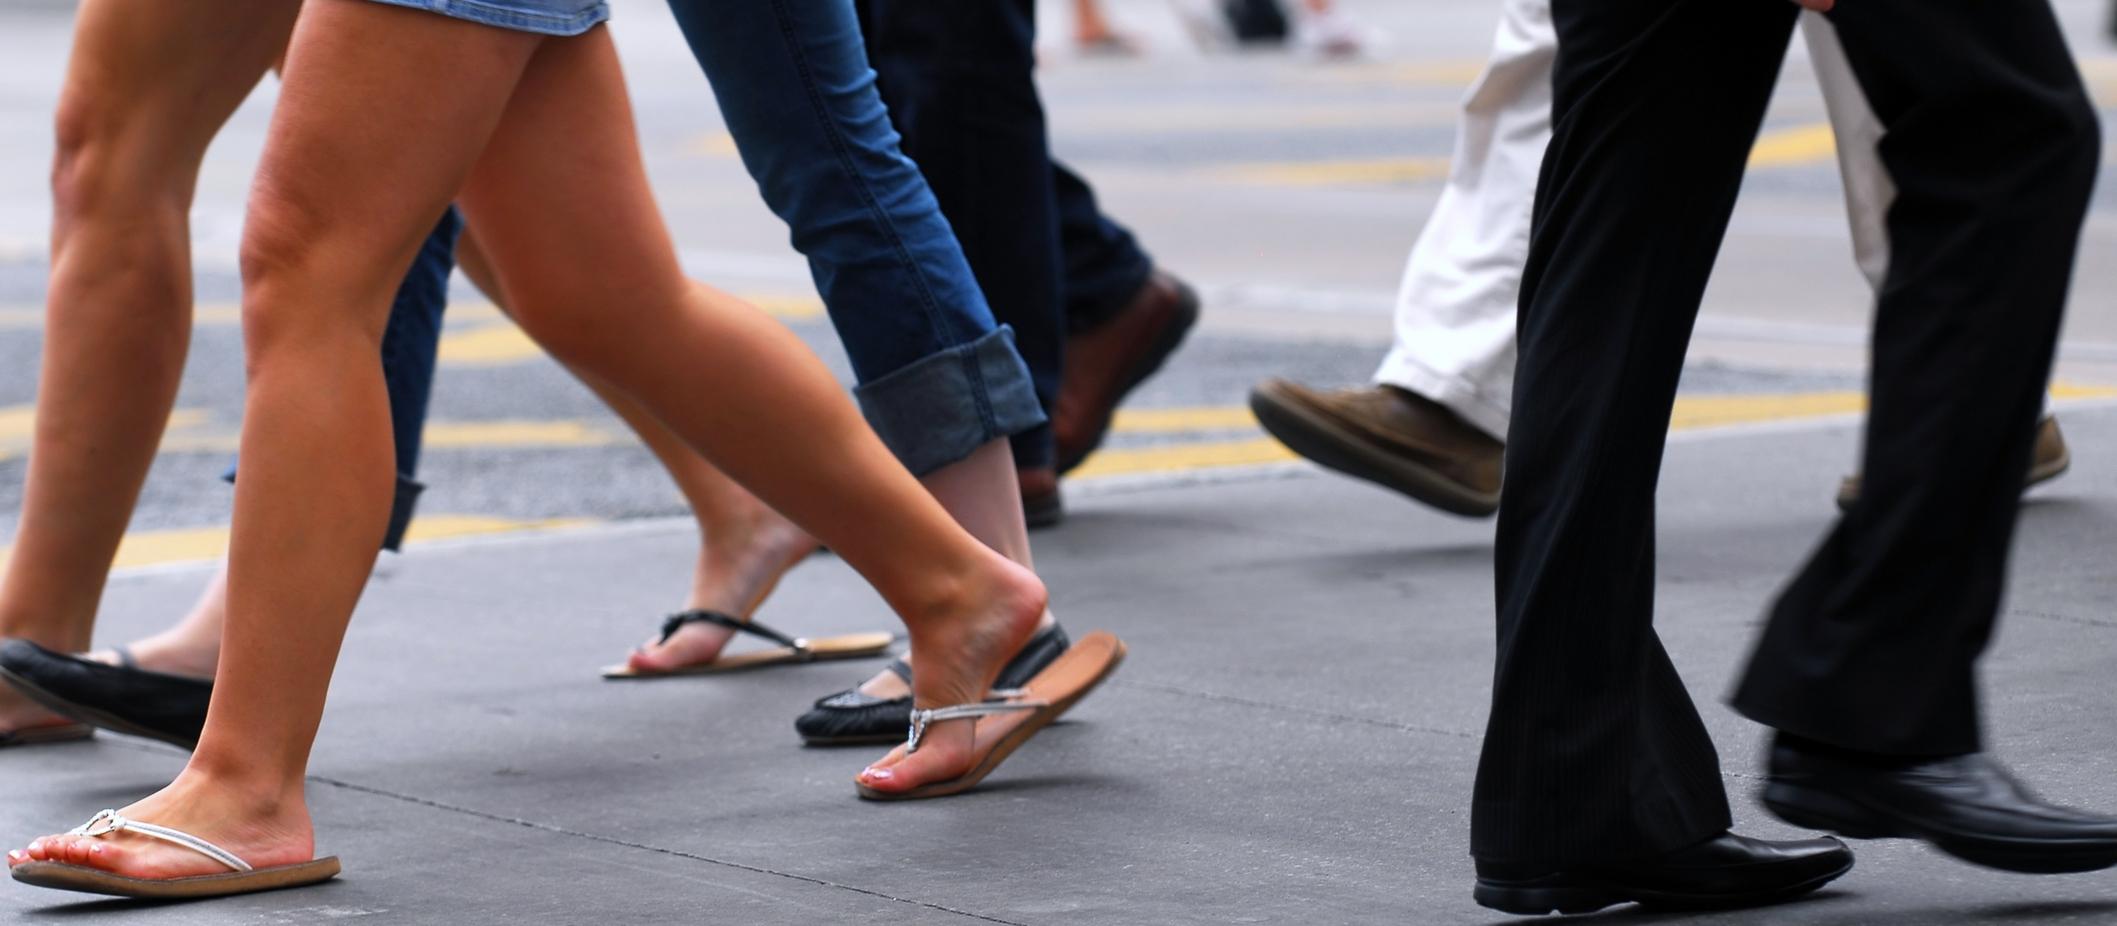 group_walking_cropped.jpg